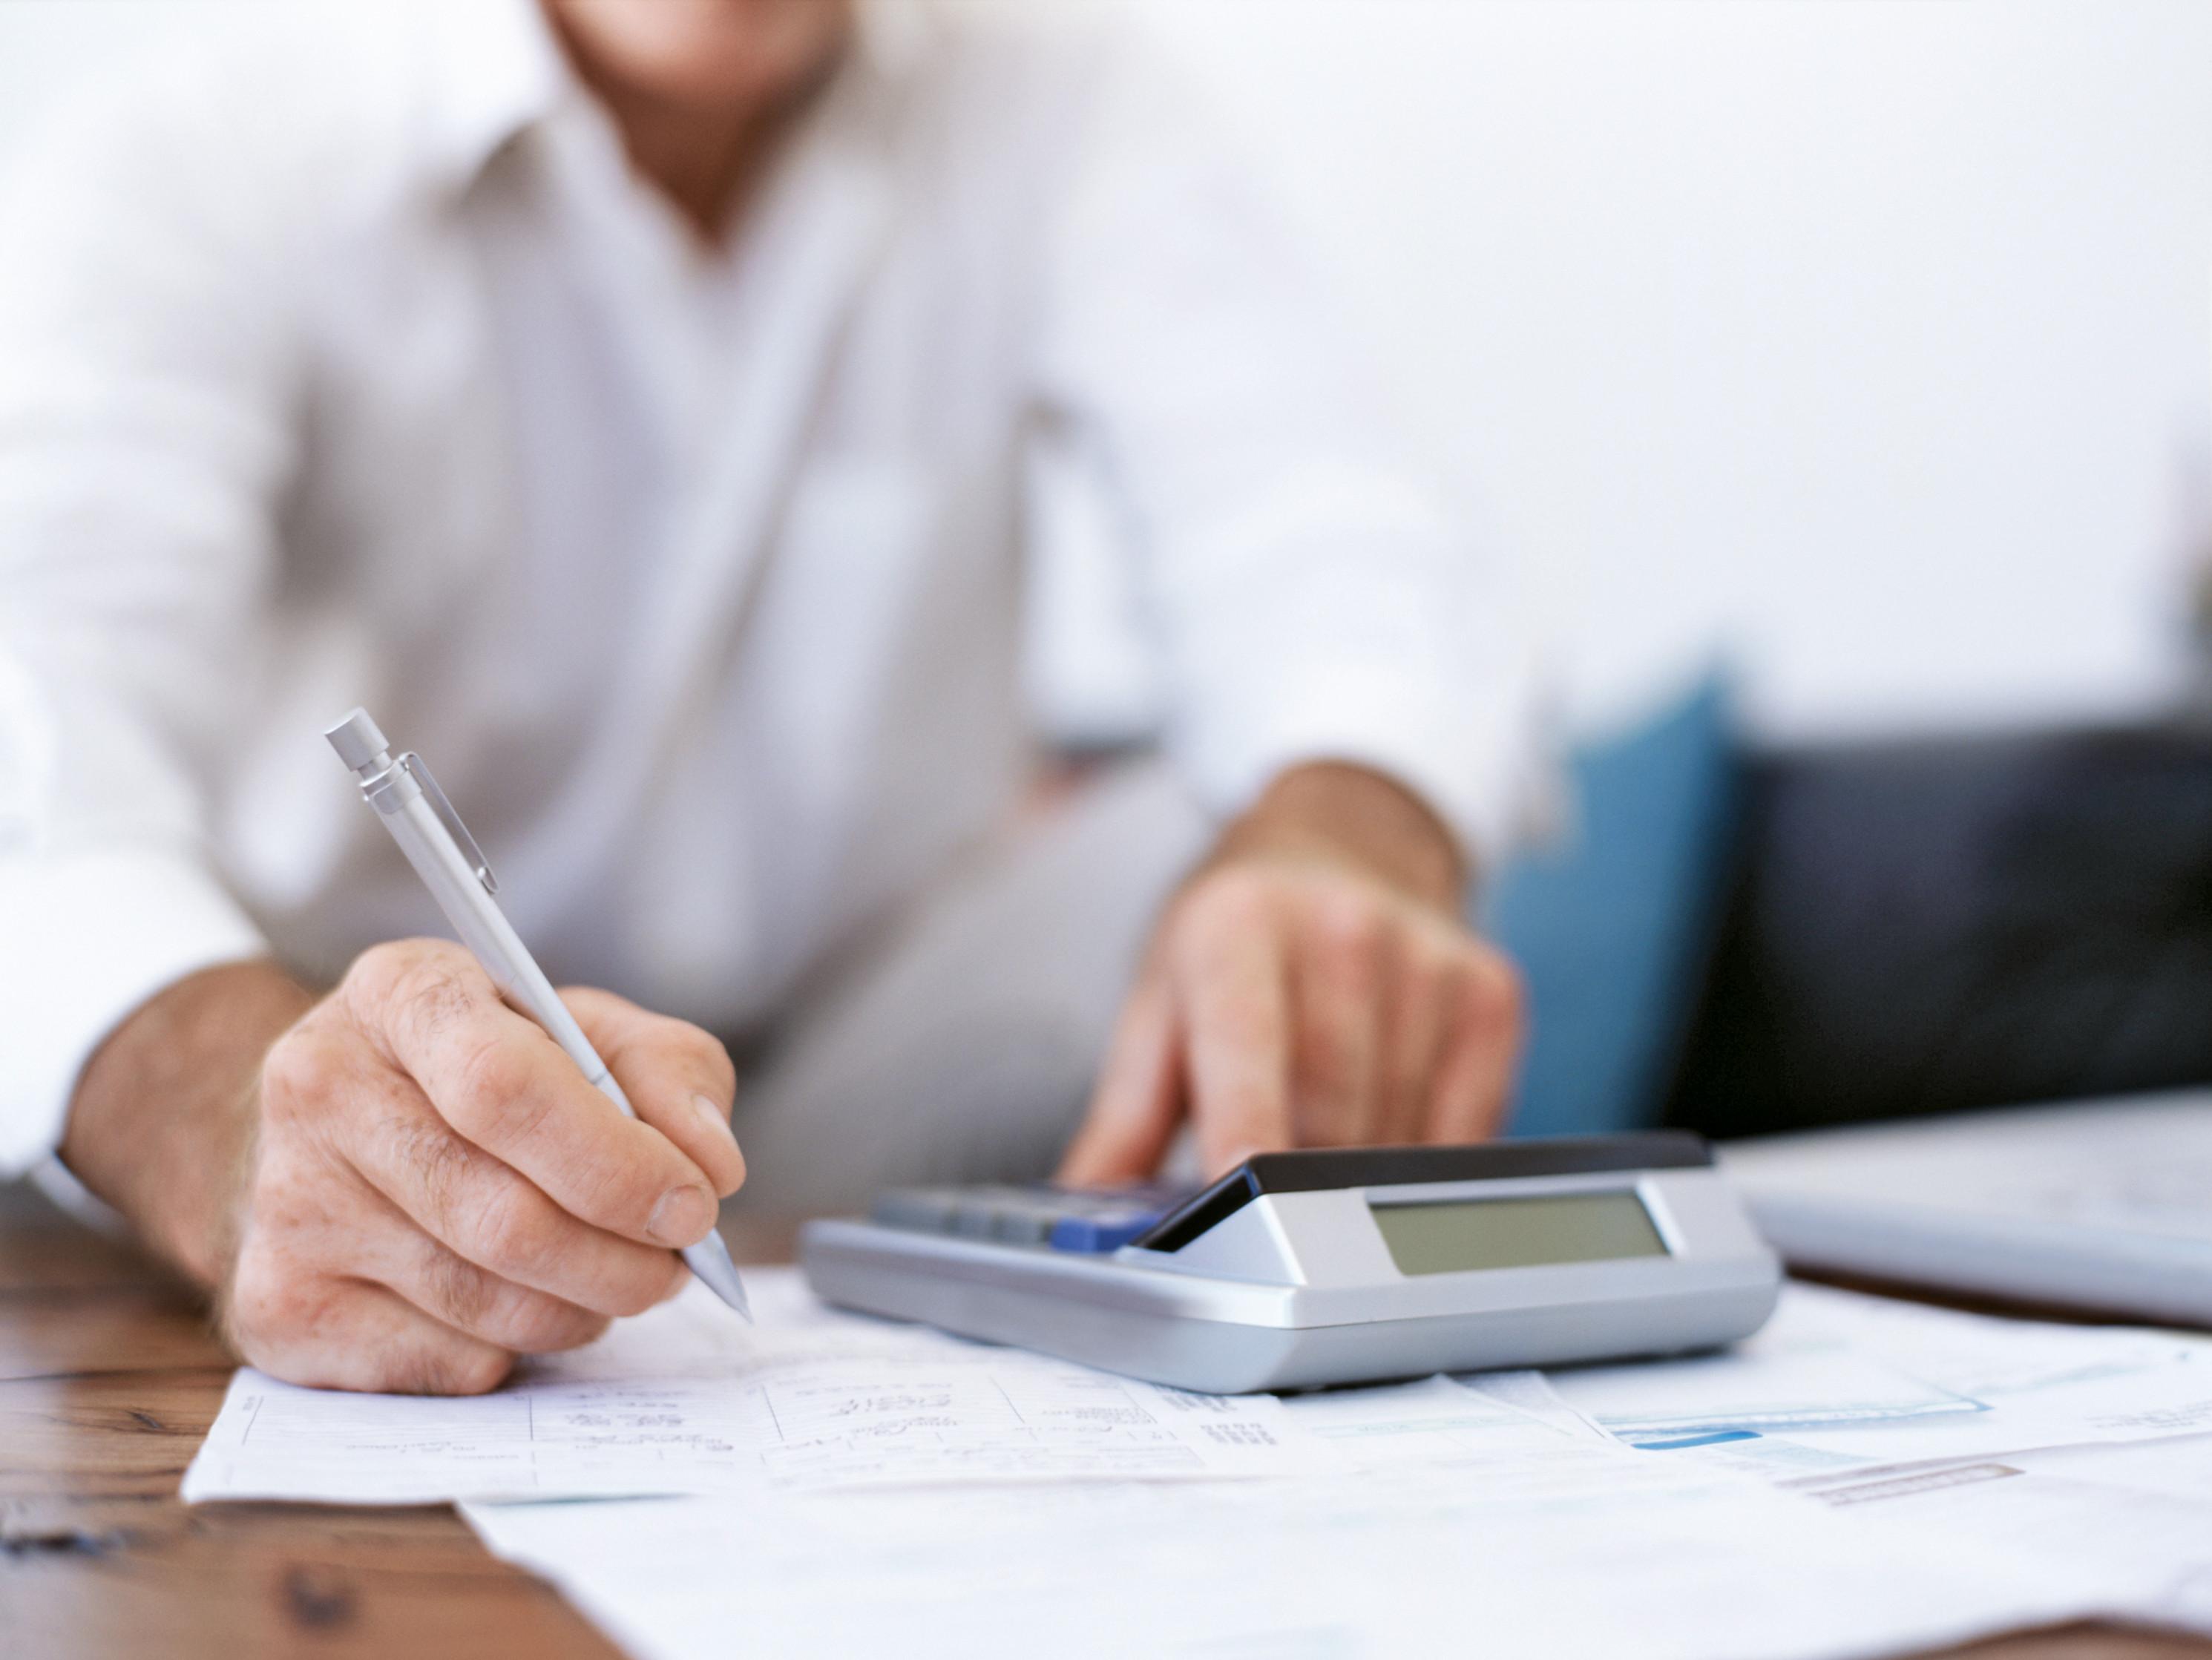 Man calculates with calculator